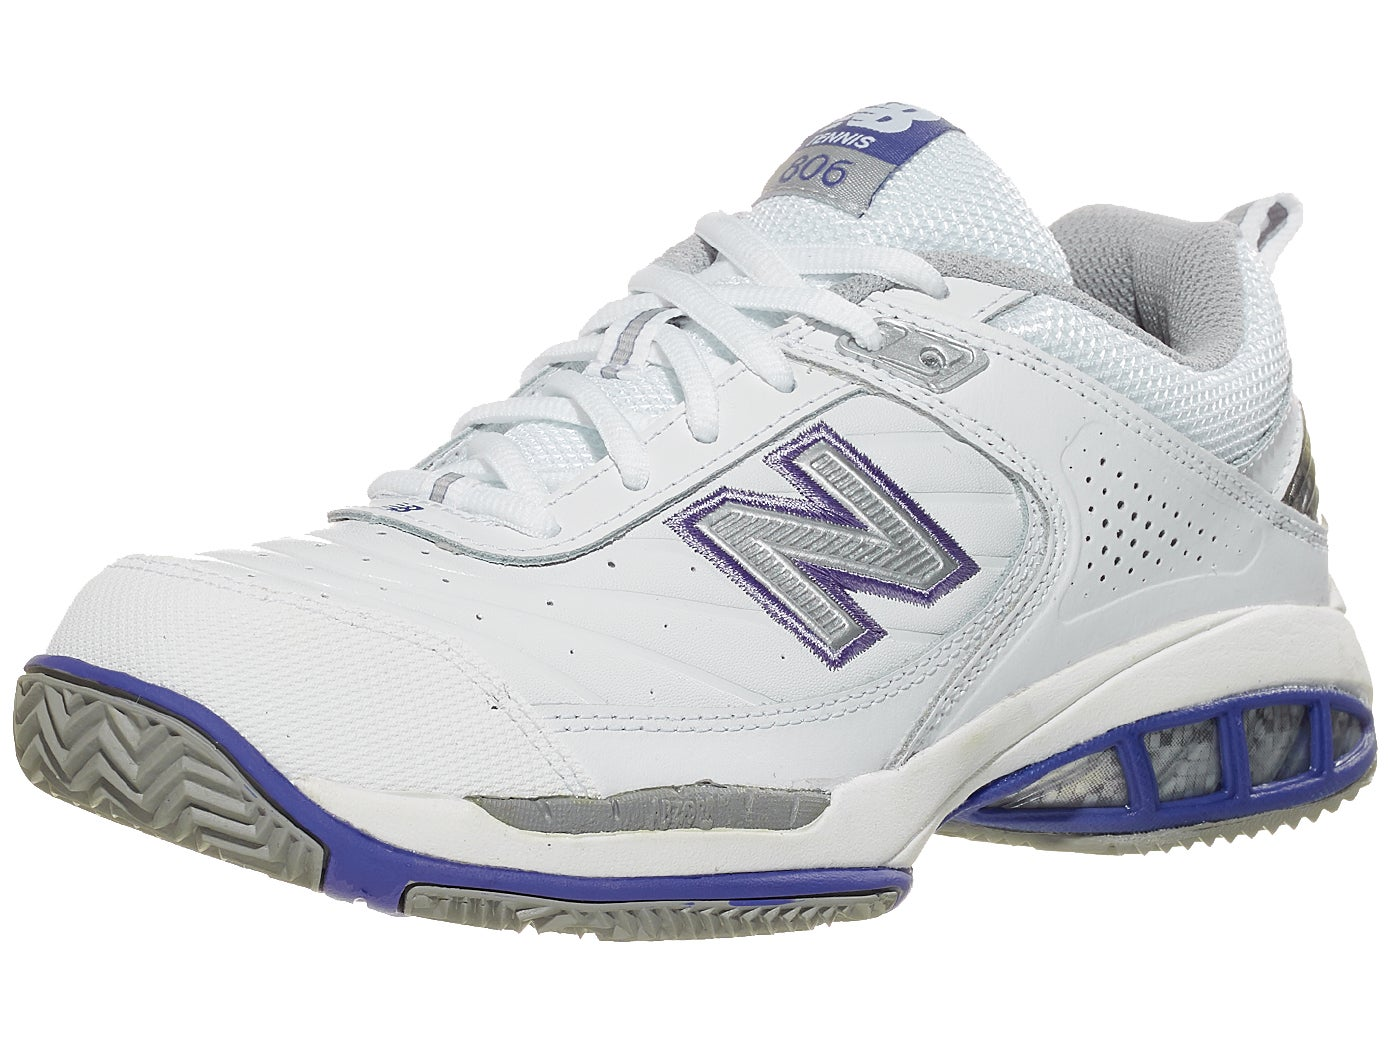 Best Women's Pickleball Shoes: New Balance Women's 806 V1 Tennis Shoe